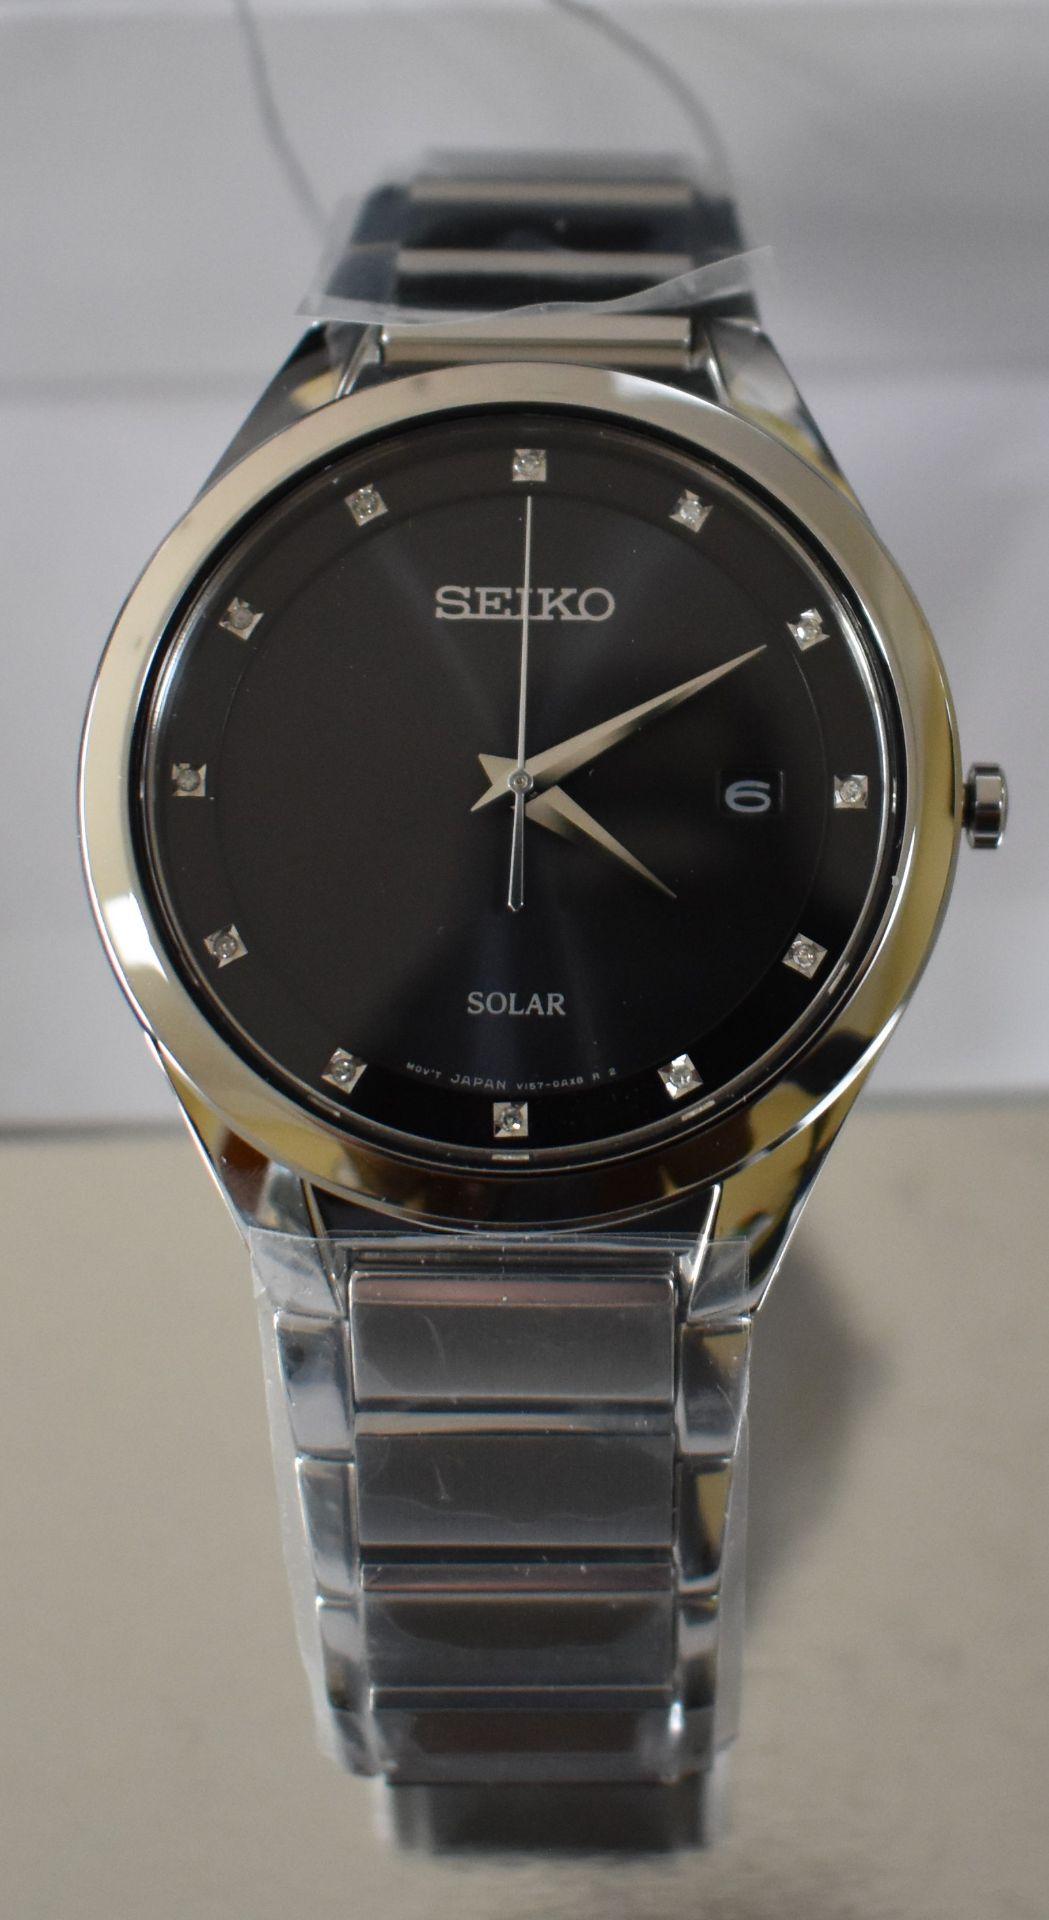 Seiko Men's Watch SNE249P9 - Image 2 of 2